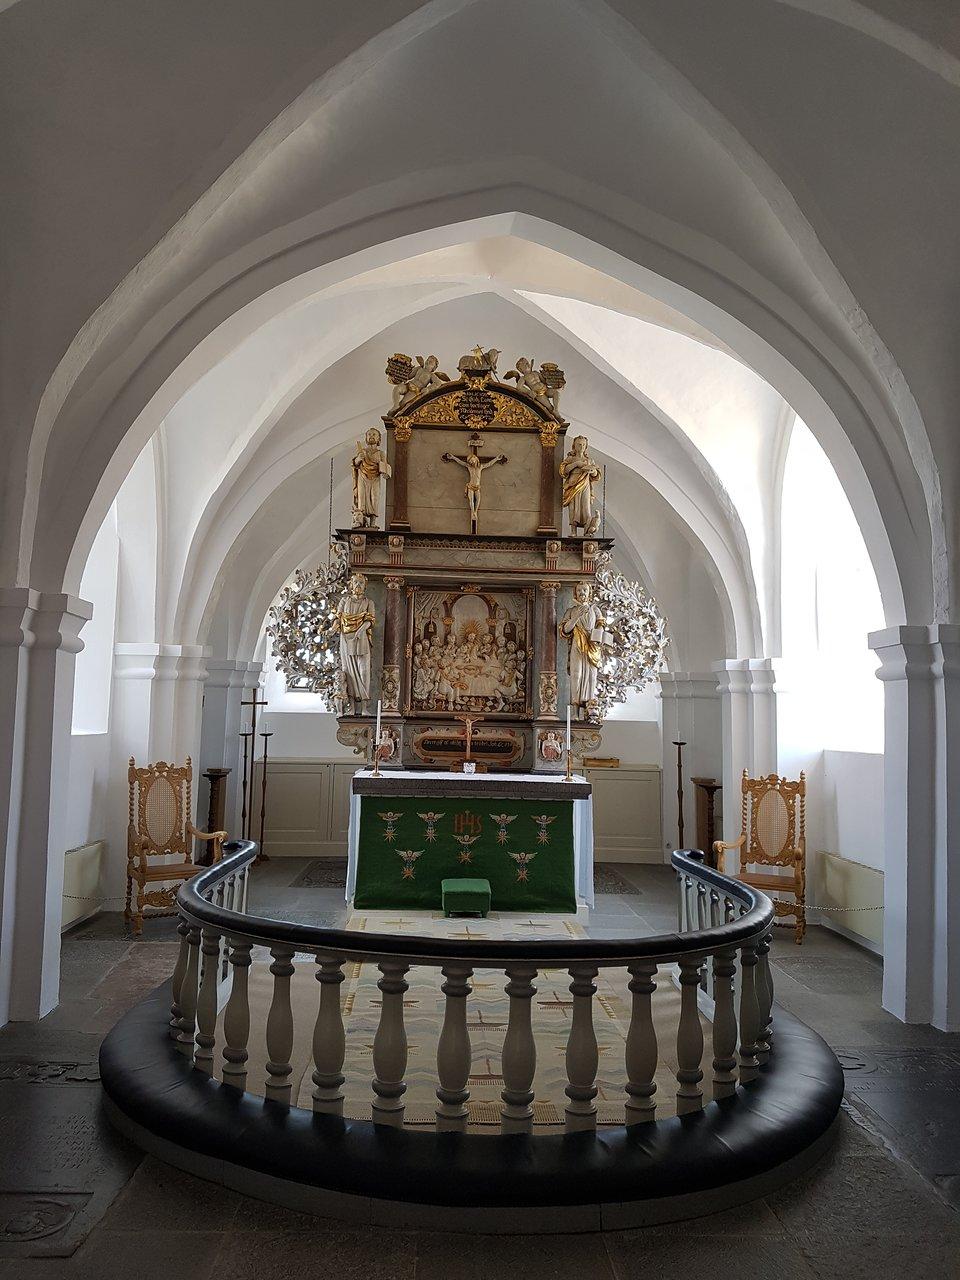 Interir - Picture of S:t Nicolai Kyrka (Nikolaikyrkan), Orebro